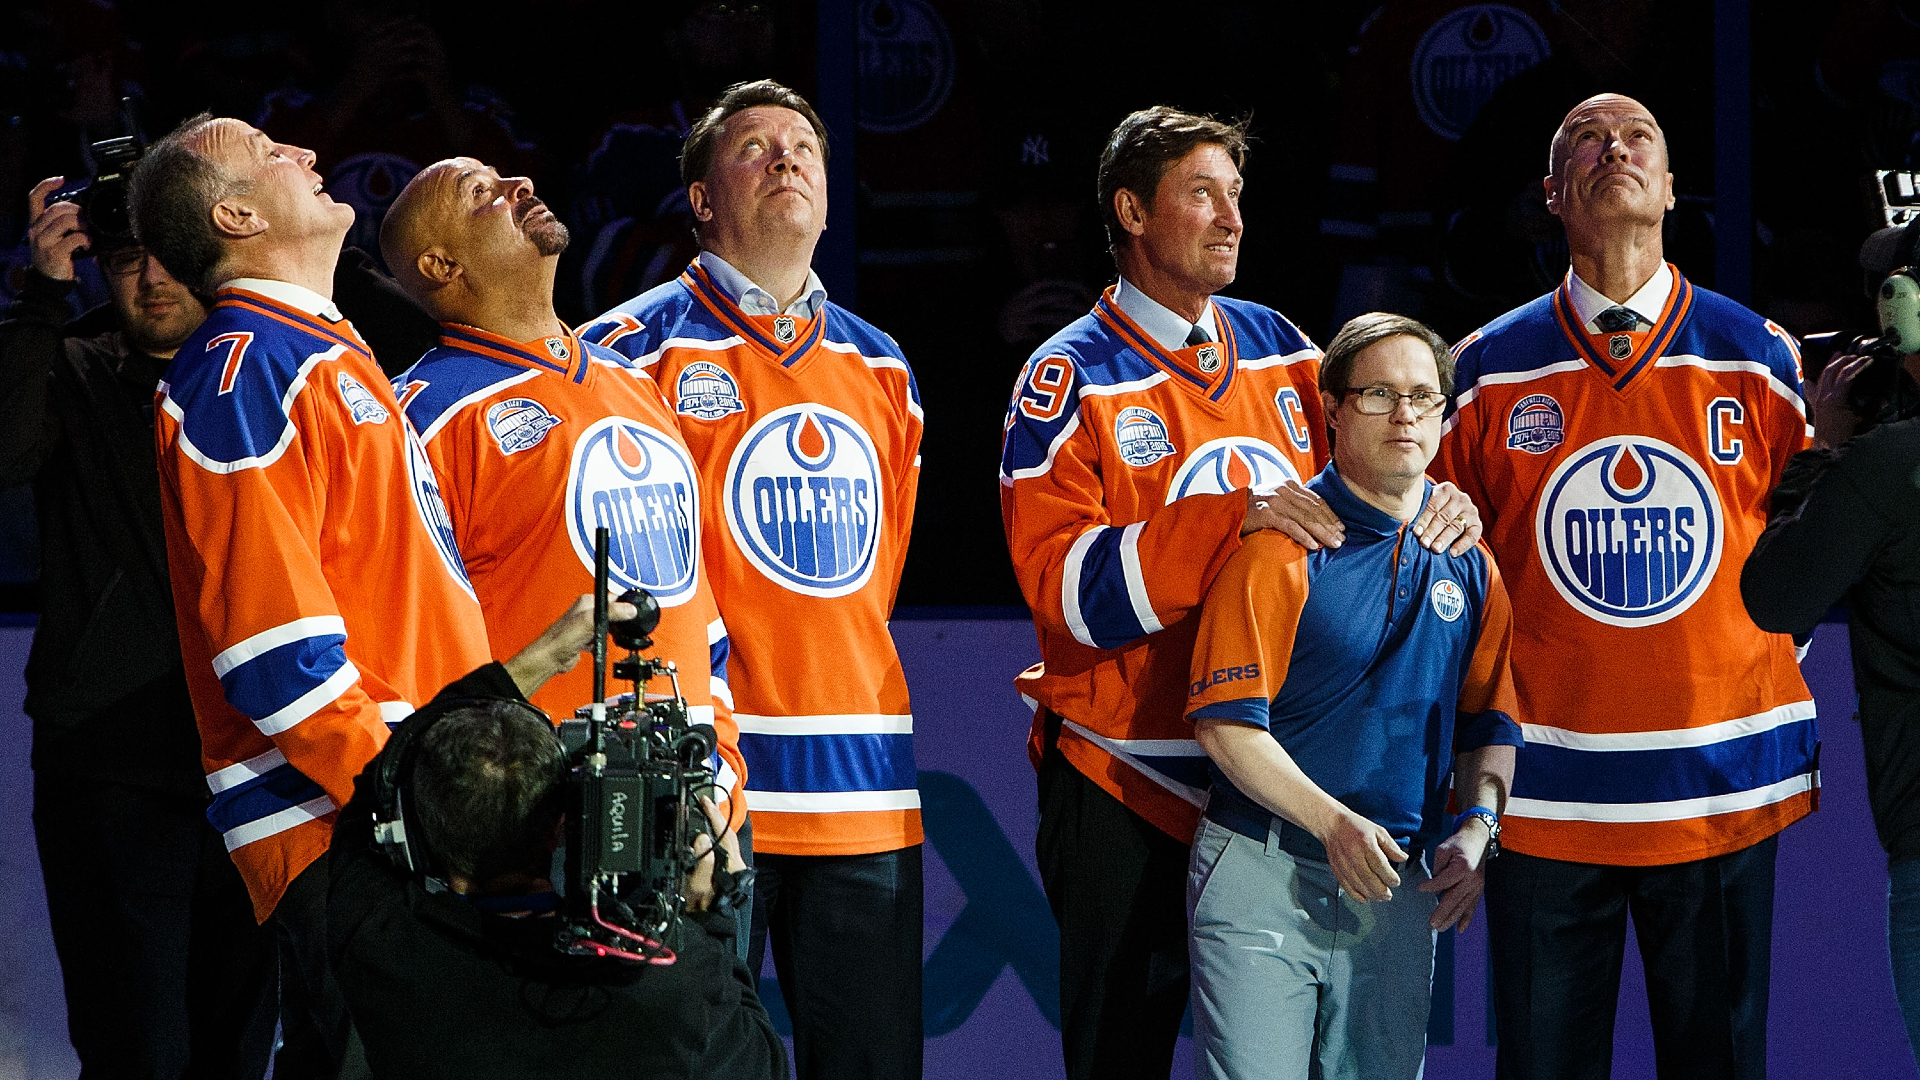 Joey Moss, beloved Edmonton sports figure, dies at 57: Wayne Gretzky, hockey world react 4